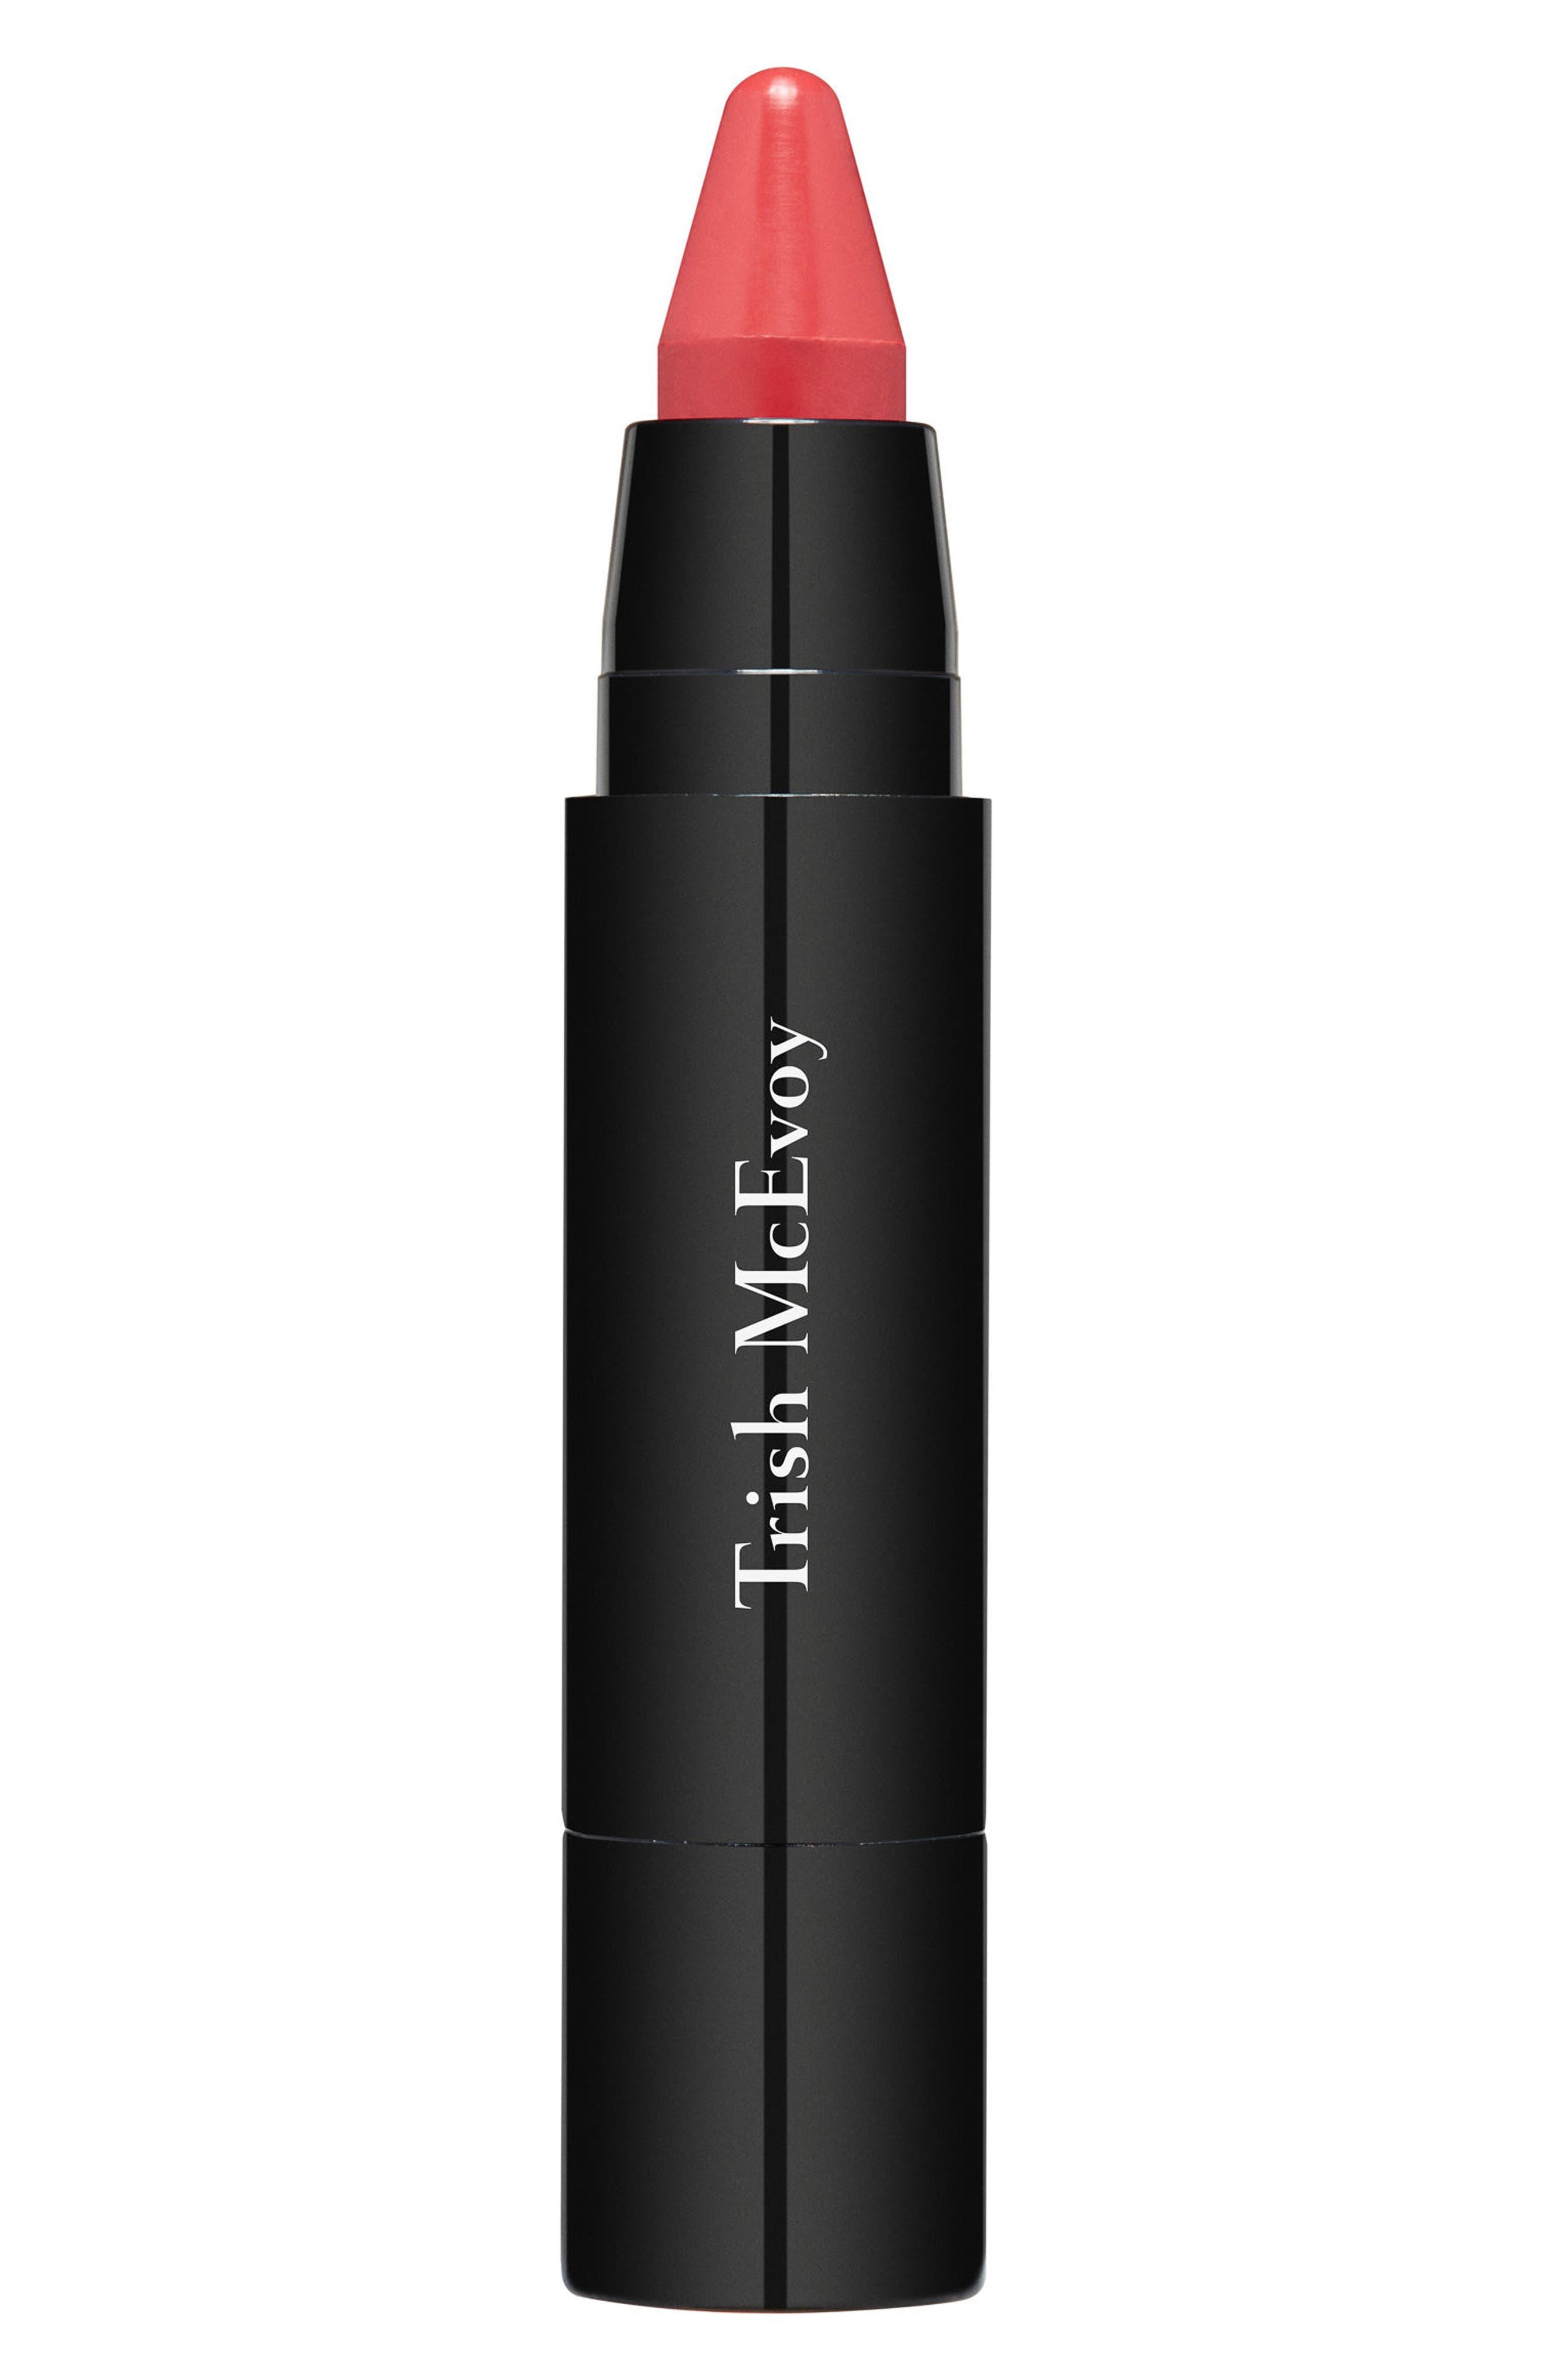 Trish McEvoy Beauty Booster® Lip & Cheek Color